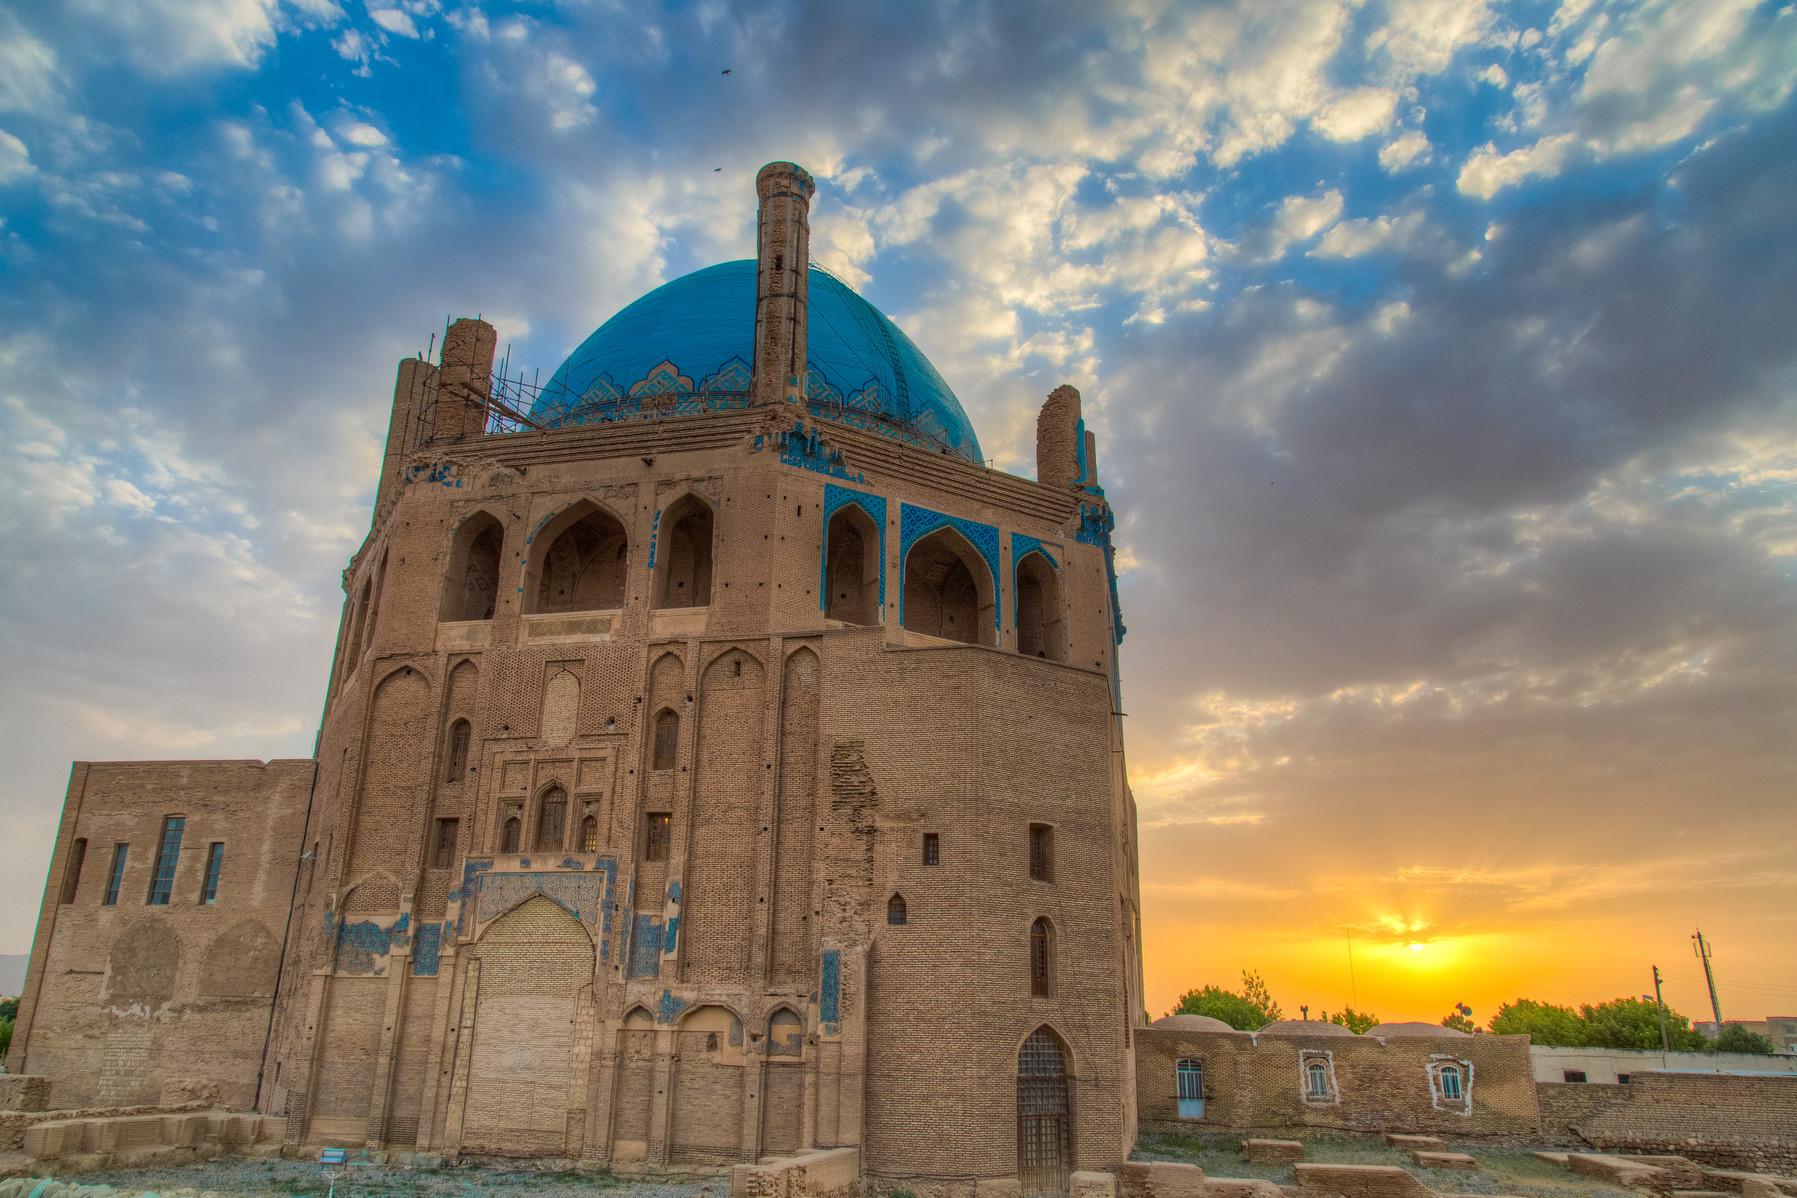 تور زنجان تخت سلیمان سلطانیه